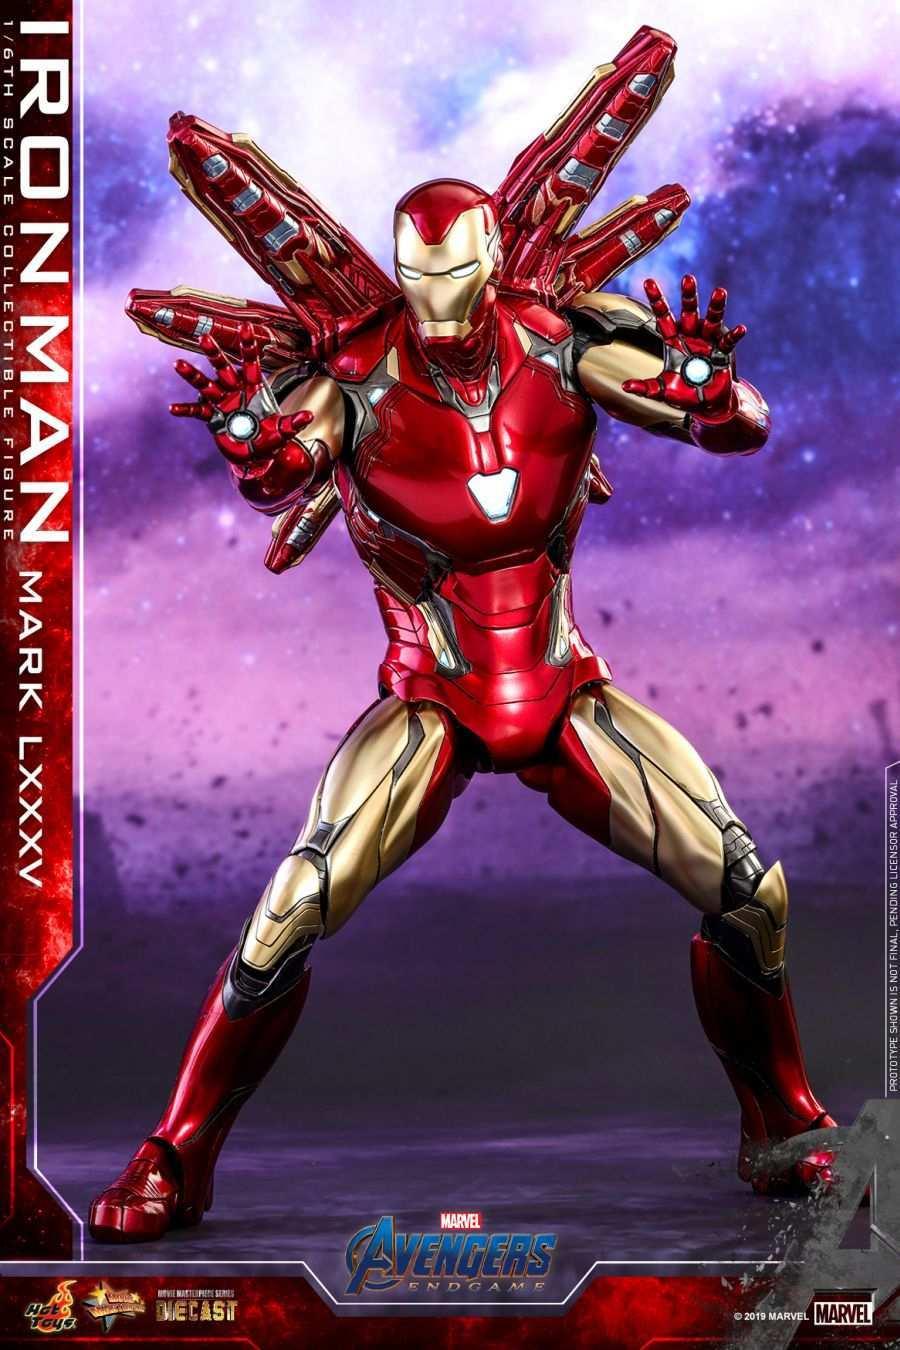 Hot Toys - Avengers 4 - Iron Man Mark LXXXV collectible figure_PR9